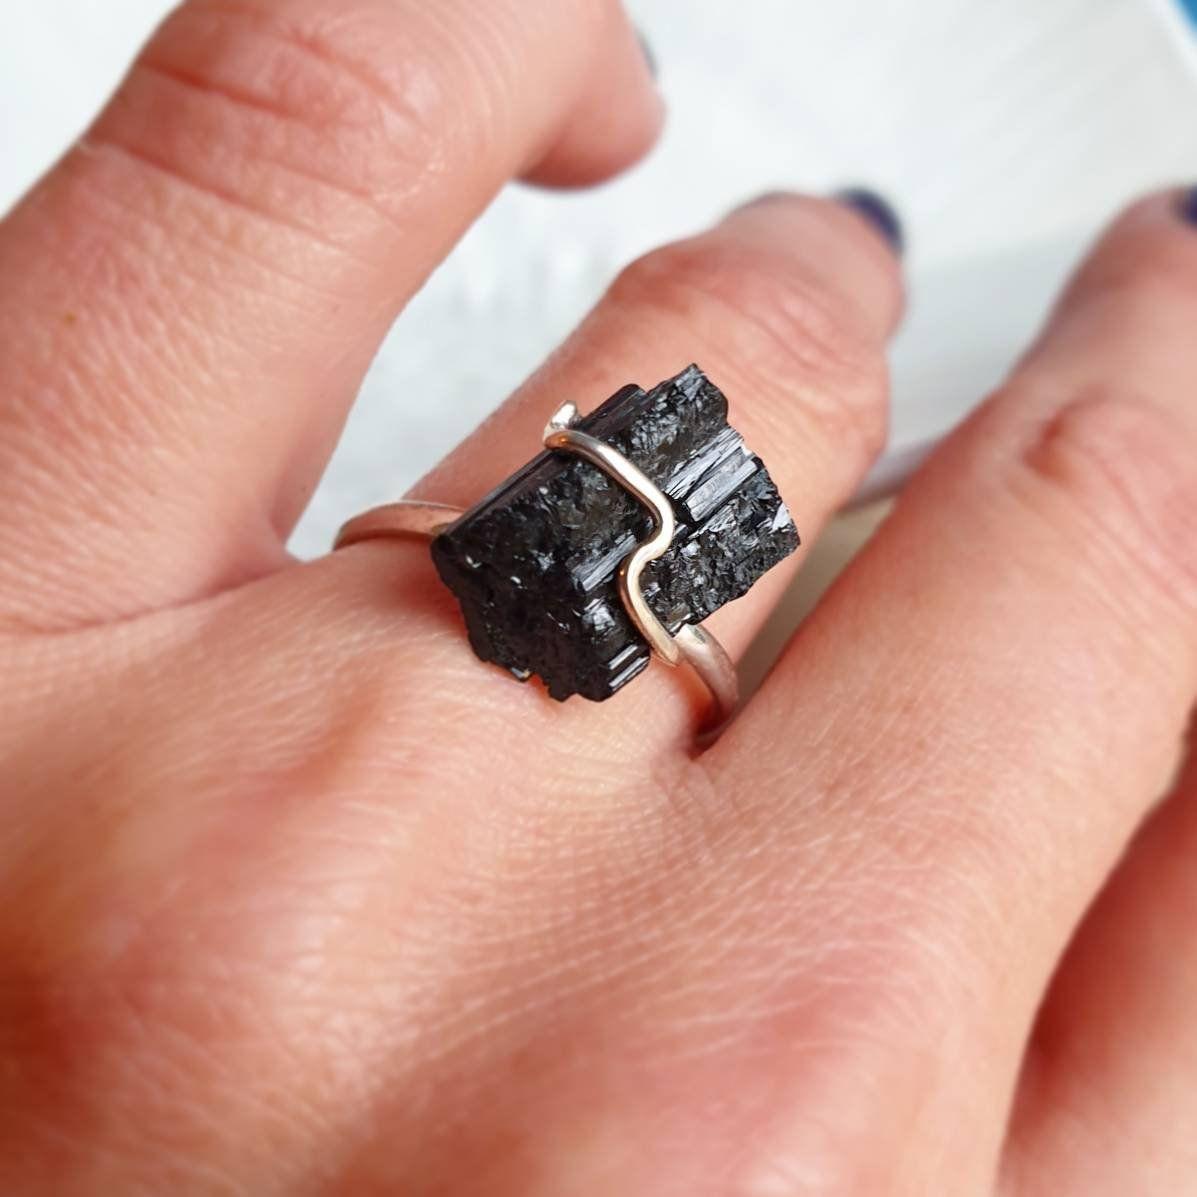 Black Tourmaline Ring Raw Tourmaline Black Gemstone Ring 7 3 4 Etsy In 2020 Black Tourmaline Ring Black Stone Ring Tourmaline Ring